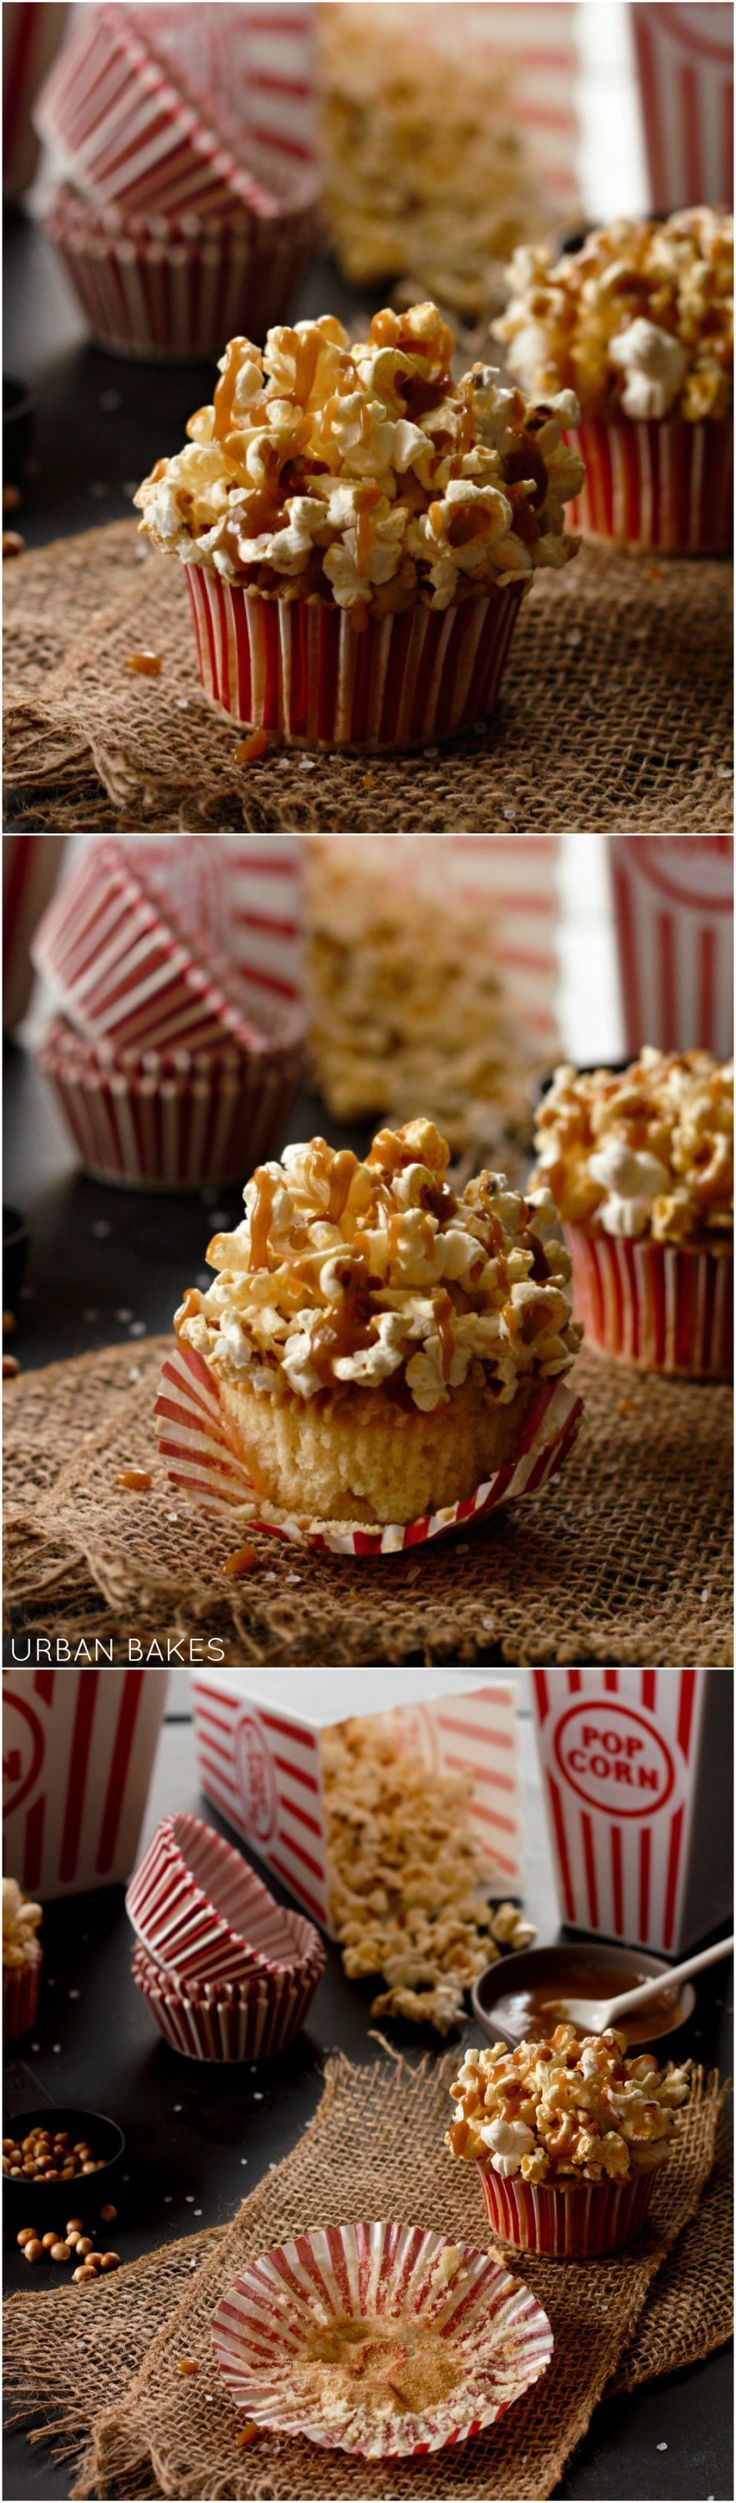 Brown Butter Salted Caramel Popcorn Cupcakes   http://urbanbakes.com